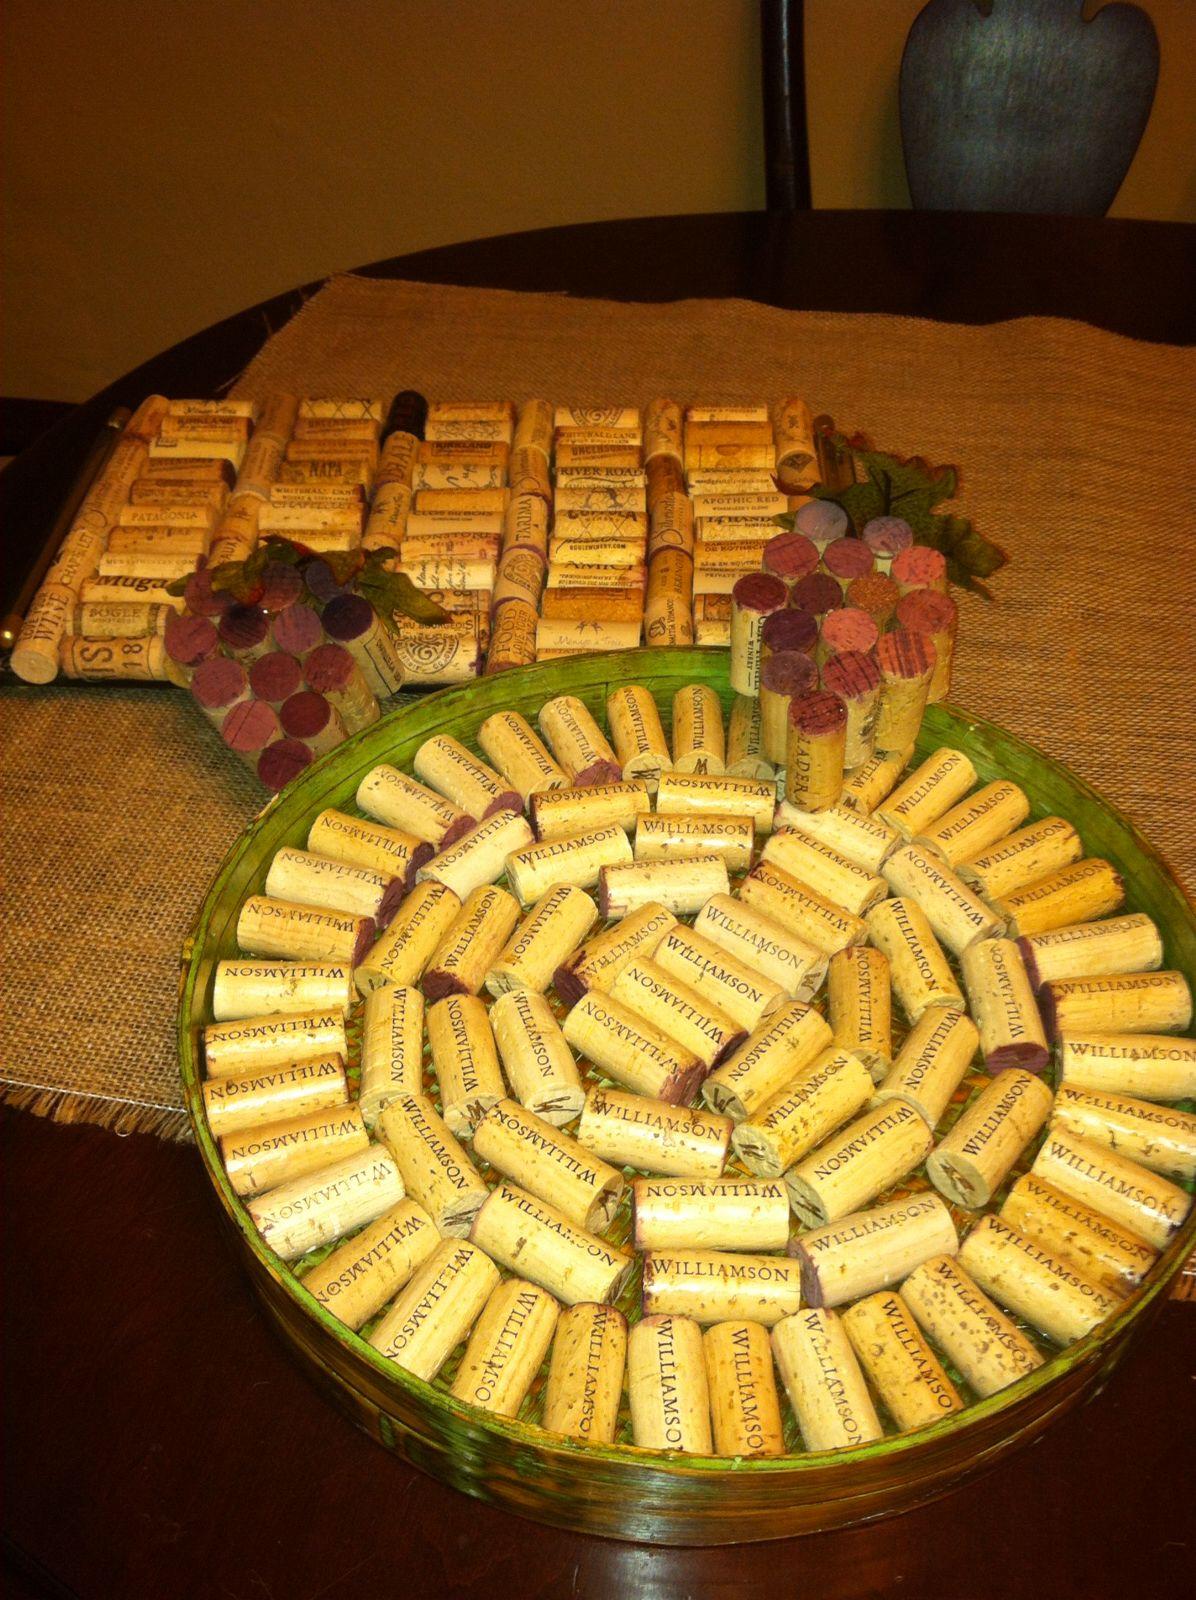 Diy wine cork projects wine pinterest for Wine cork ideas projects